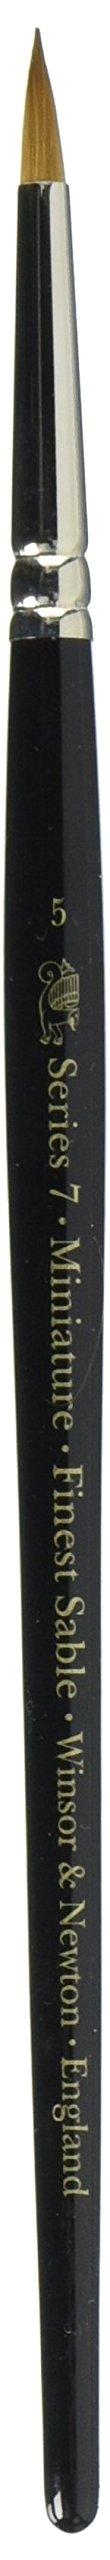 Winsor & Newton Series 7 Kolinsky Sable Miniature Watercolor Brush - Short Handle Round #5